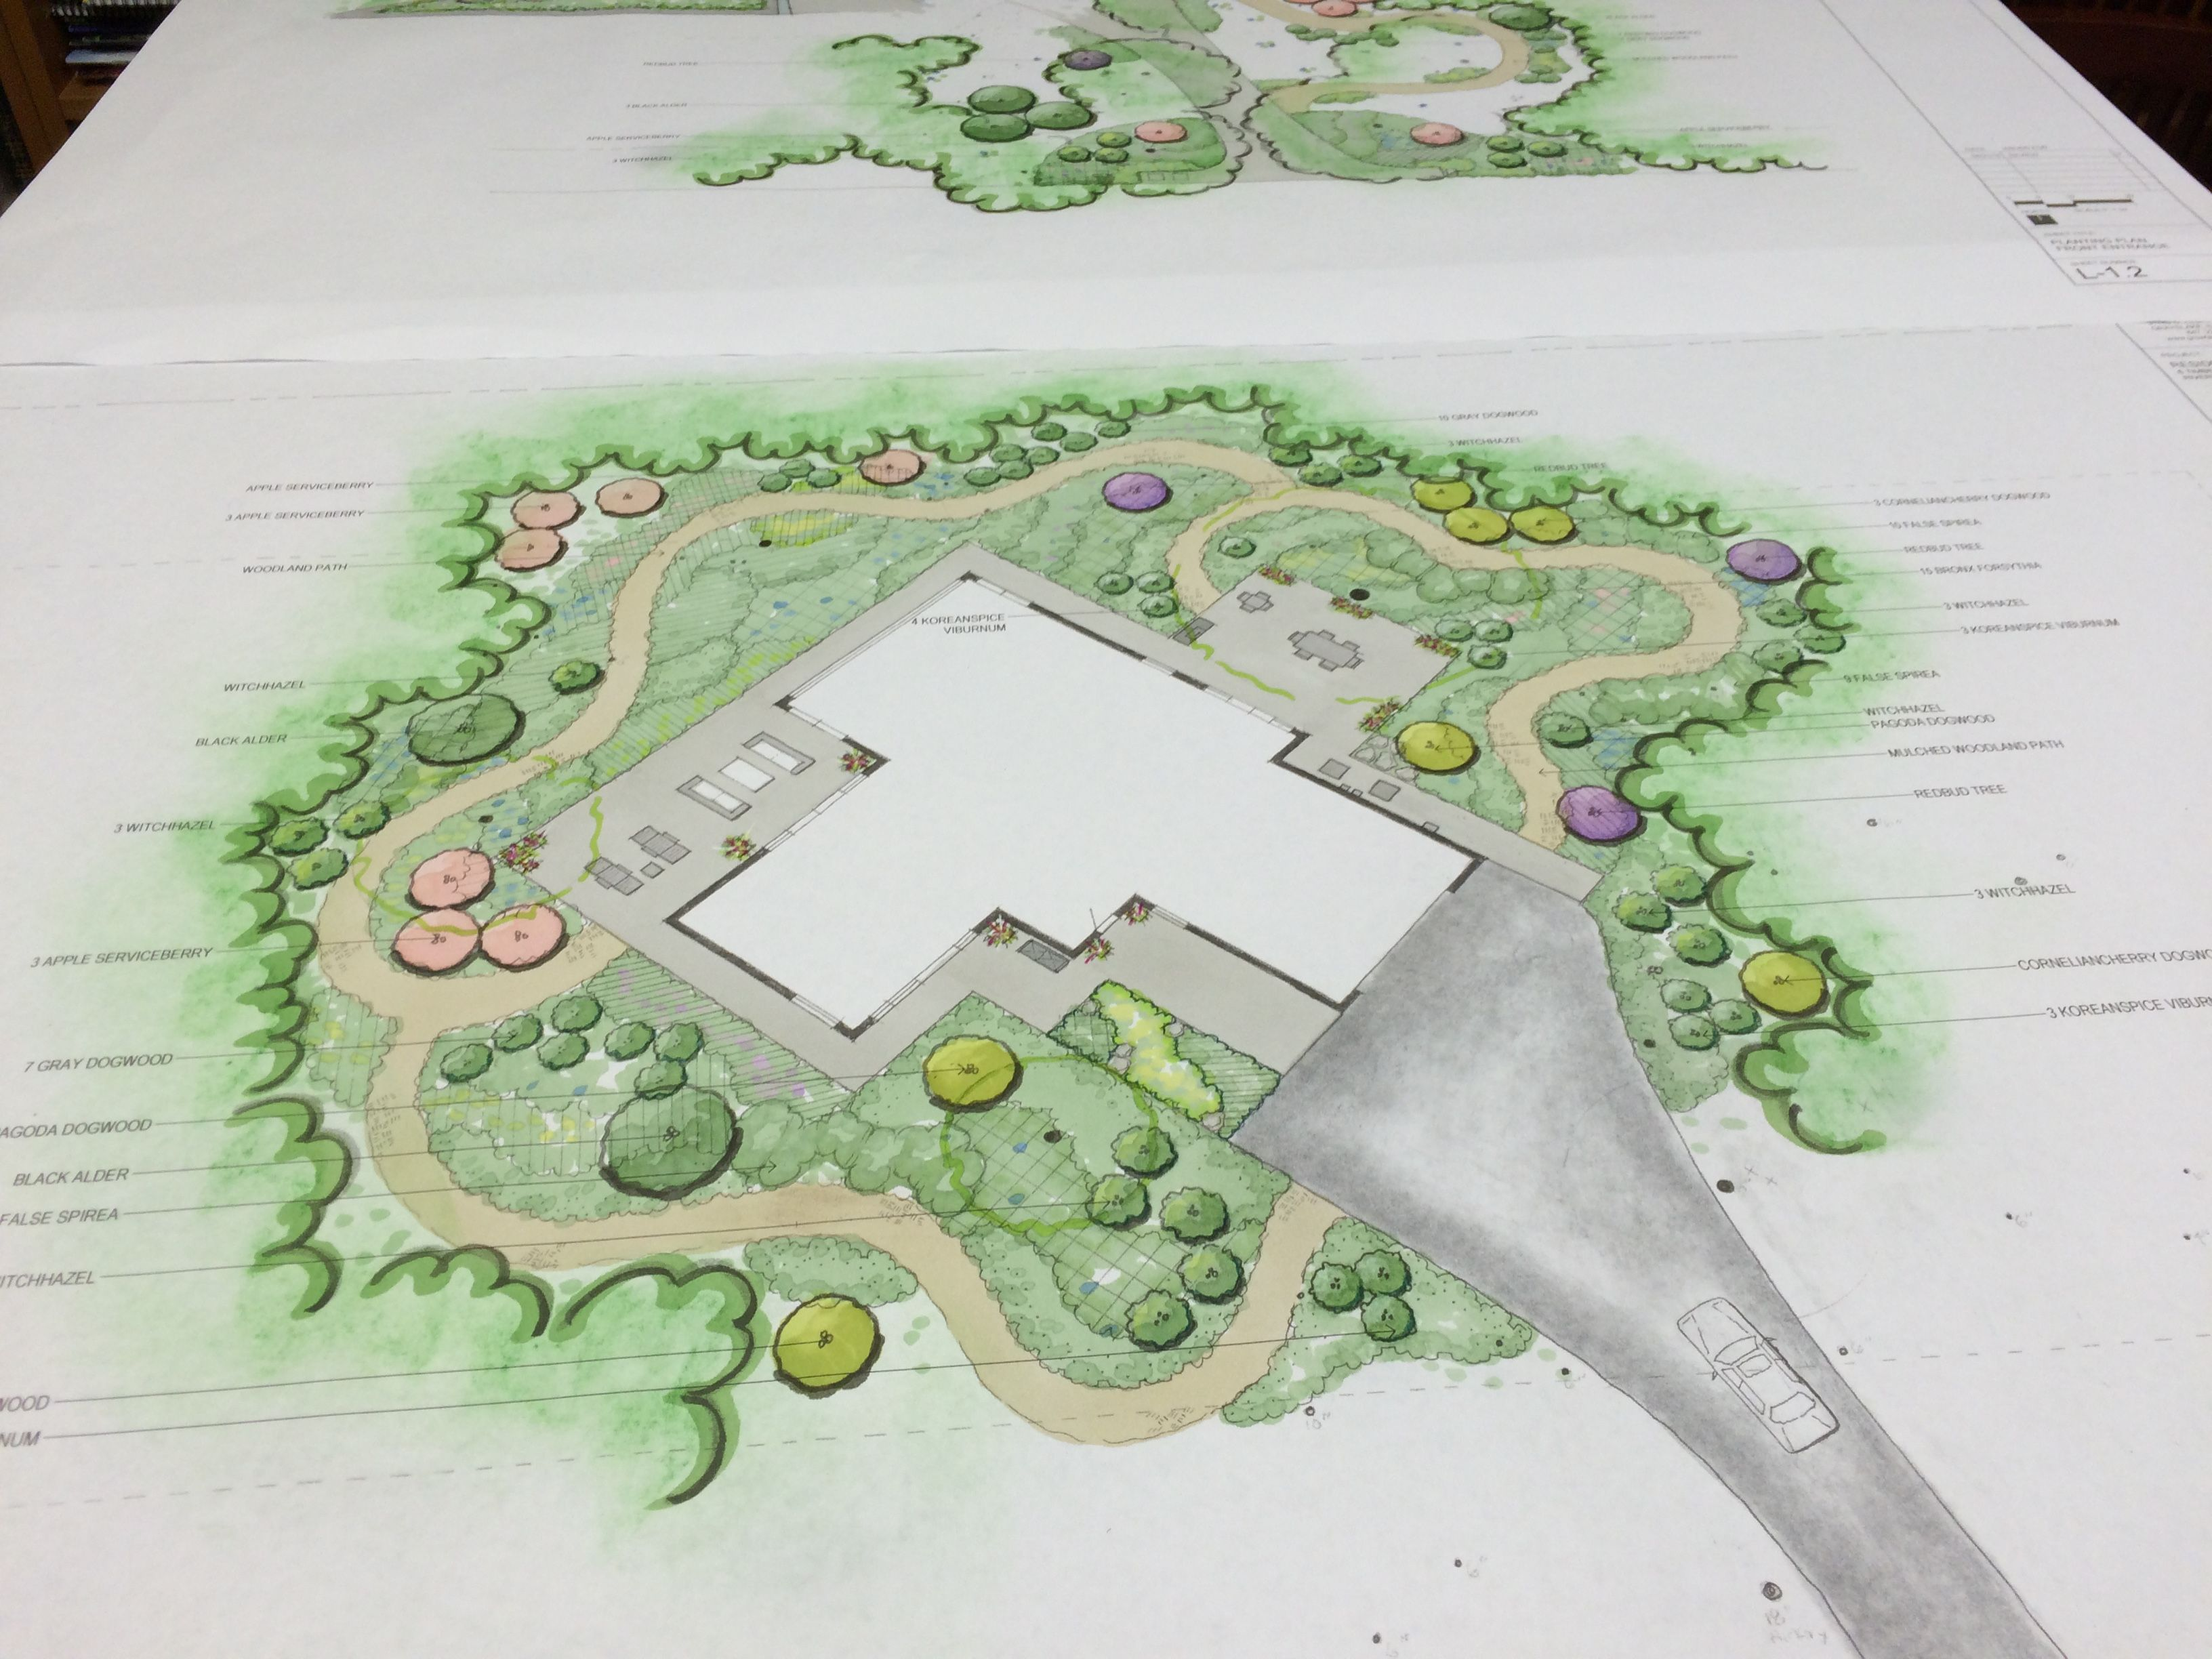 Riverwoods Woodland Paths Concept Plan